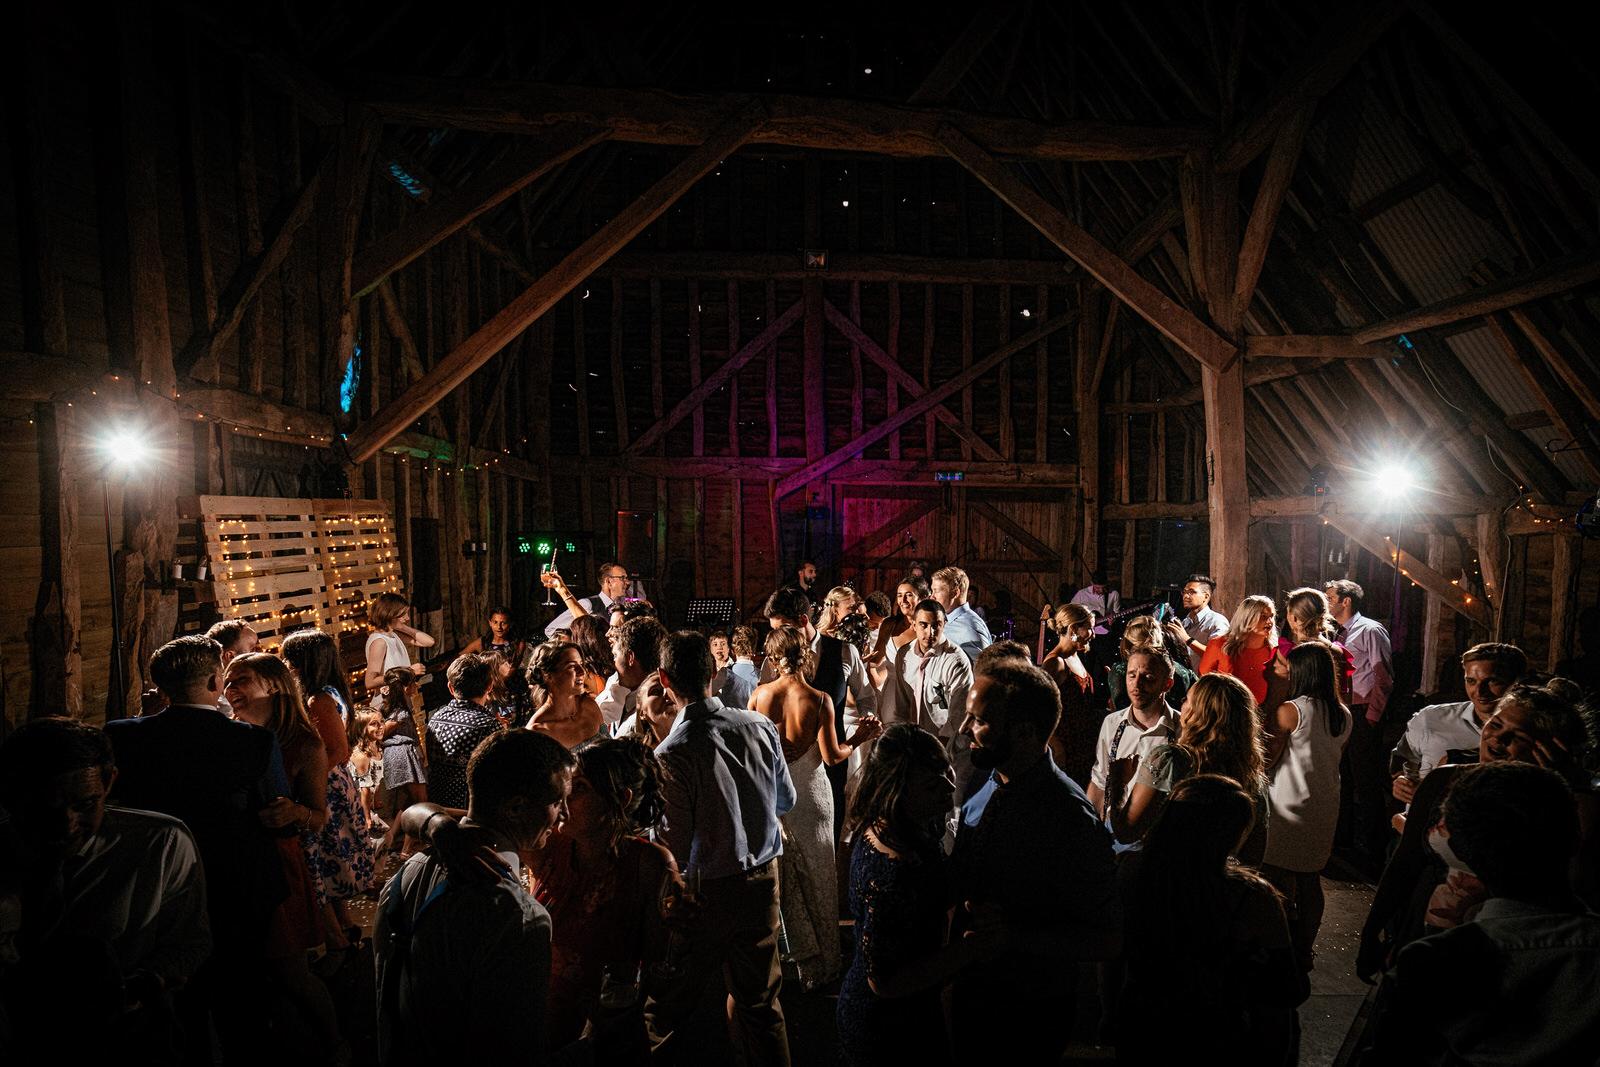 Edworth-Manor-Farm-Wedding-Photographer-078.jpg